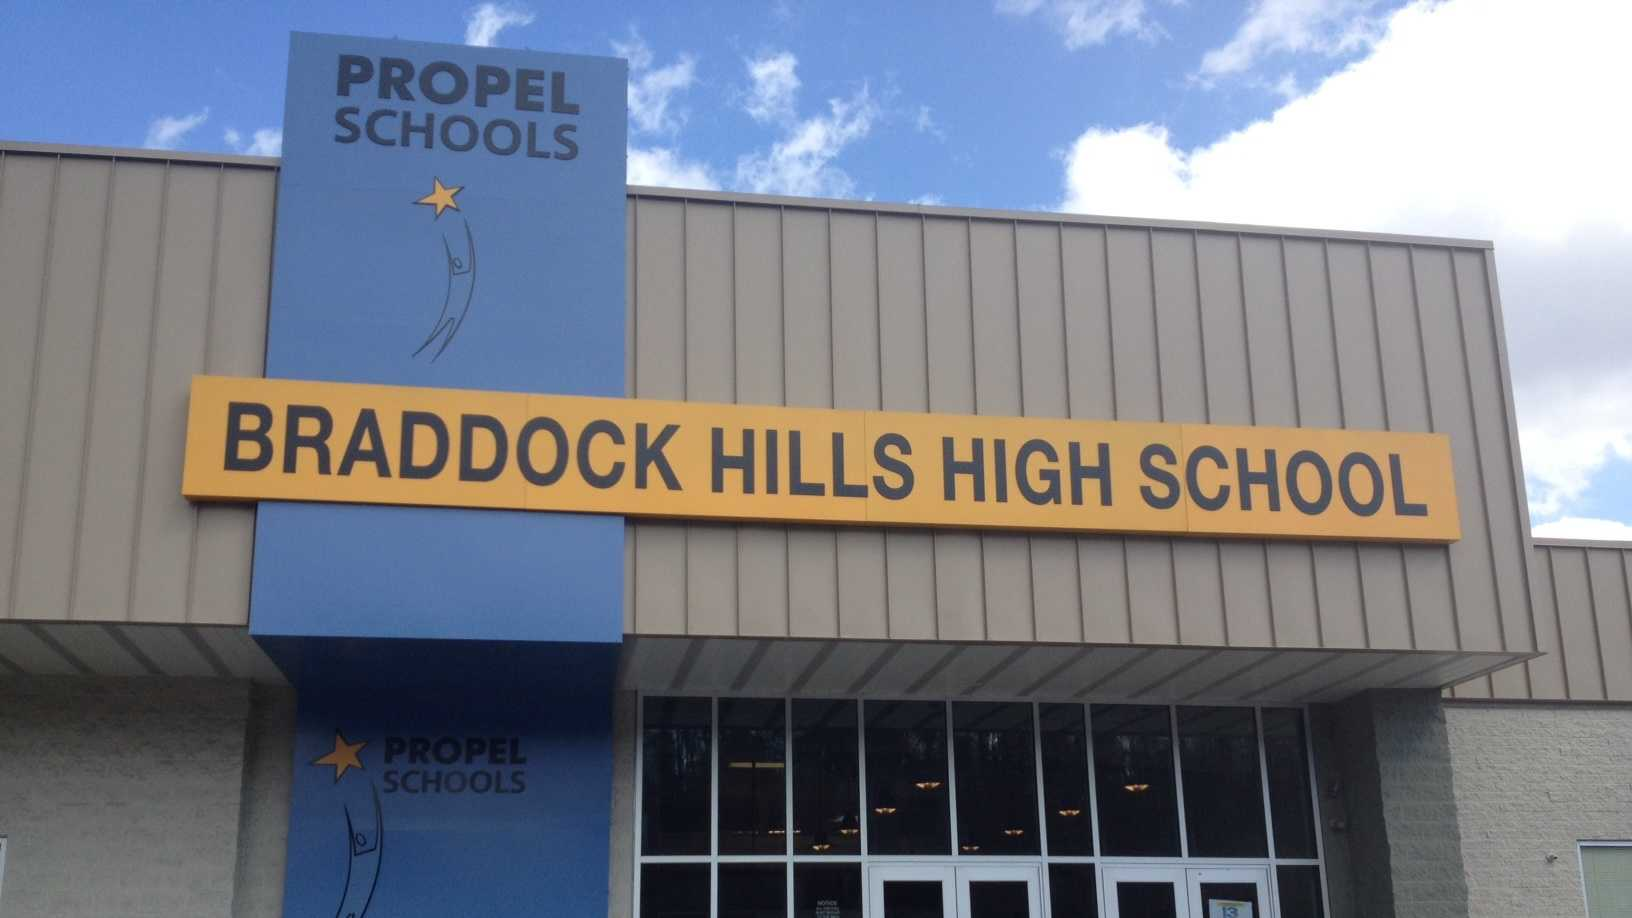 Propel Braddock Hills High School